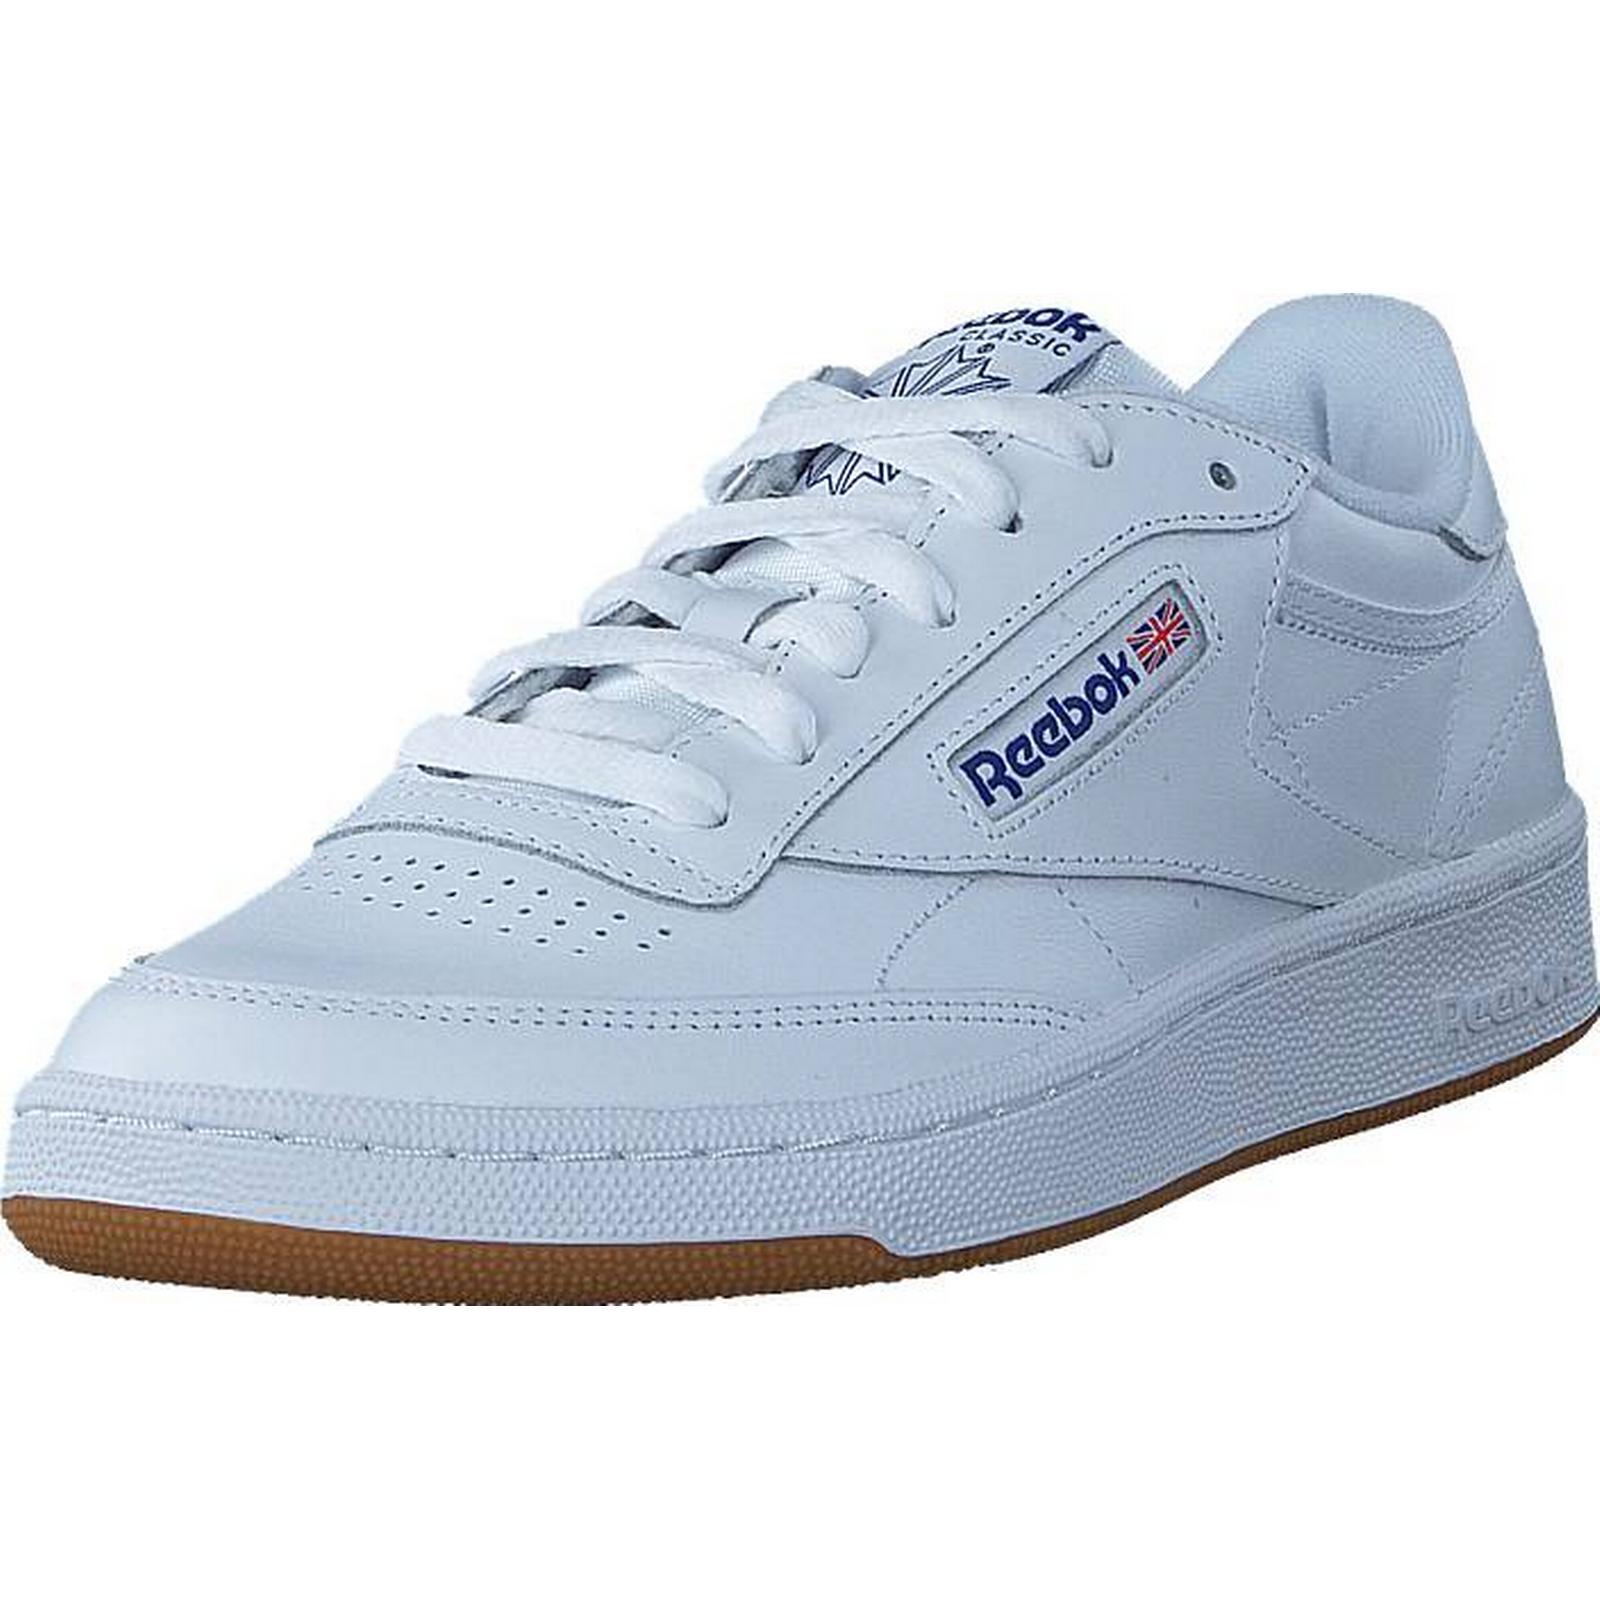 Reebok Classic Club C 85 Int-White/Royal-Gum, Int-White/Royal-Gum, 85 Shoes, Trainers & Sport Shoes , Trainers, White, Male, 42 920f64